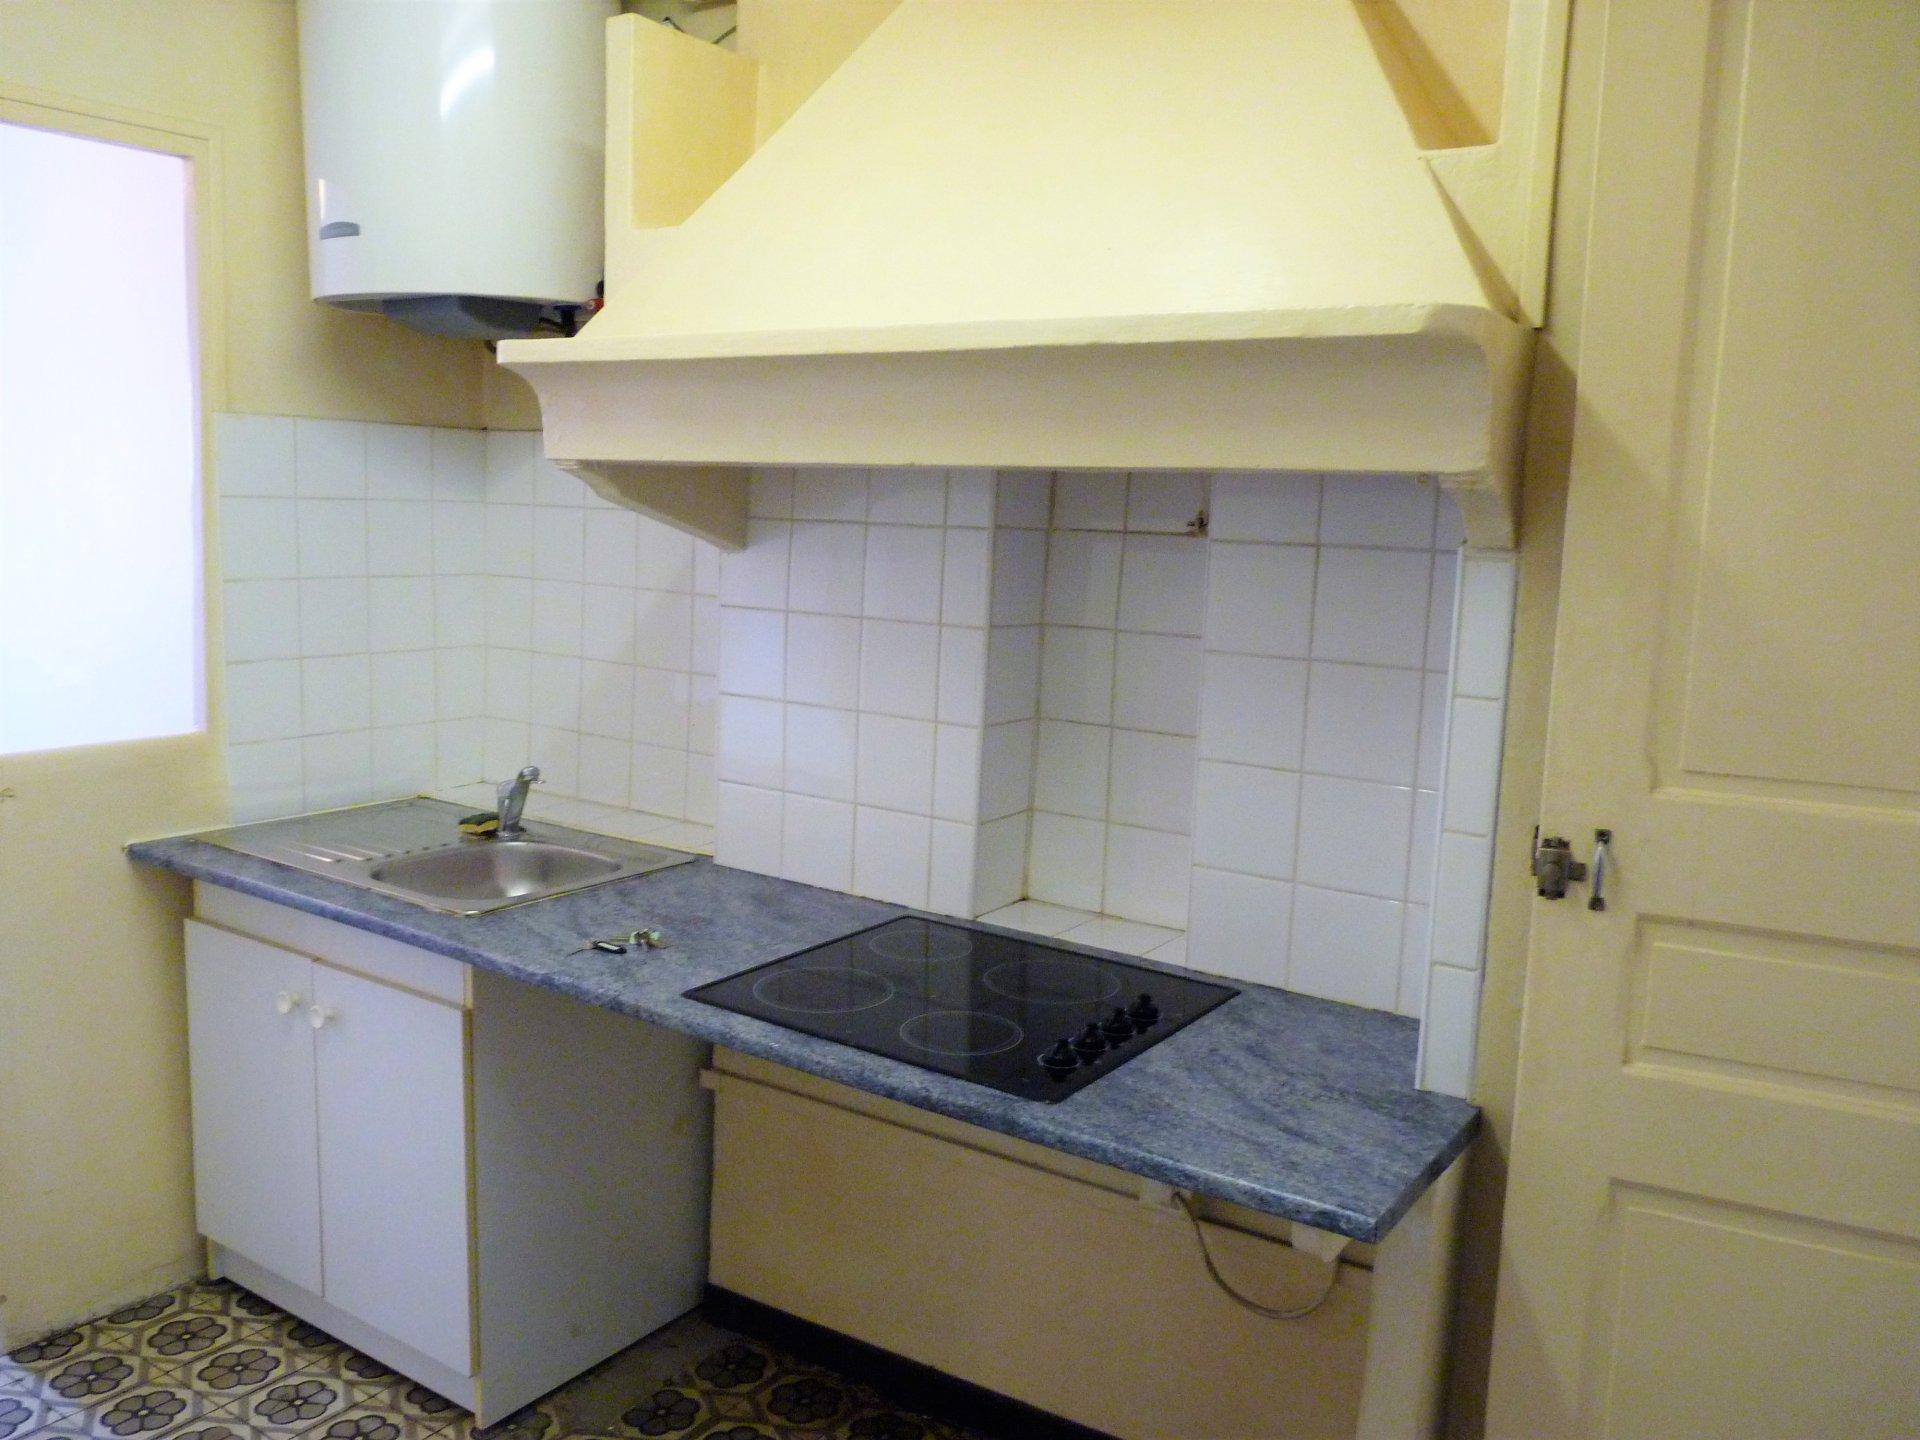 Location t2 la ciotat - Location appartement meuble la ciotat ...